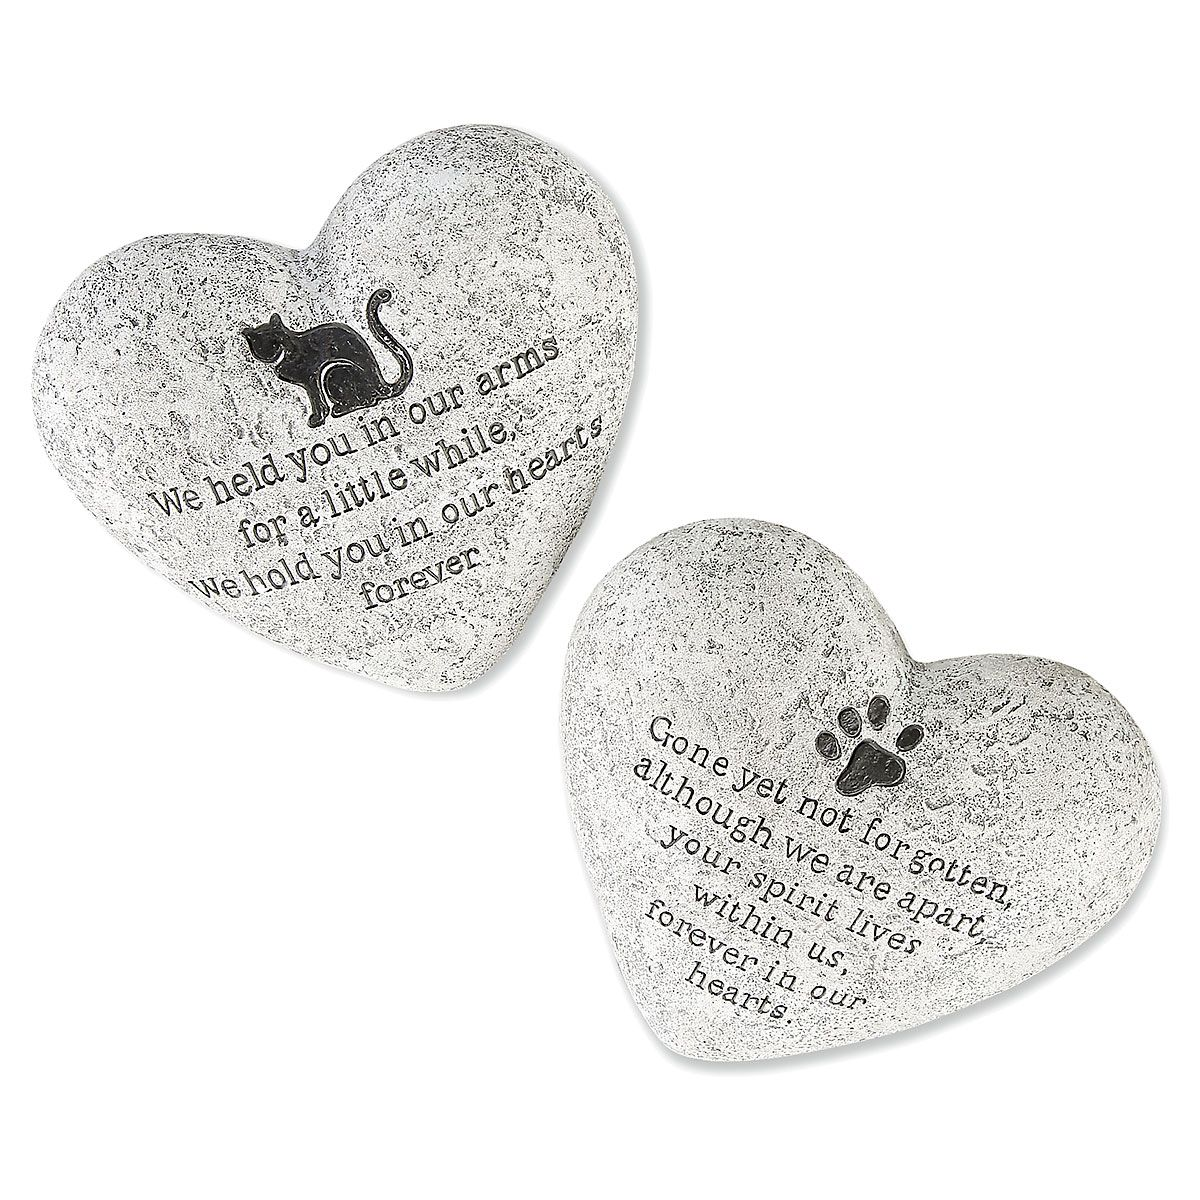 Memory Heart Stones